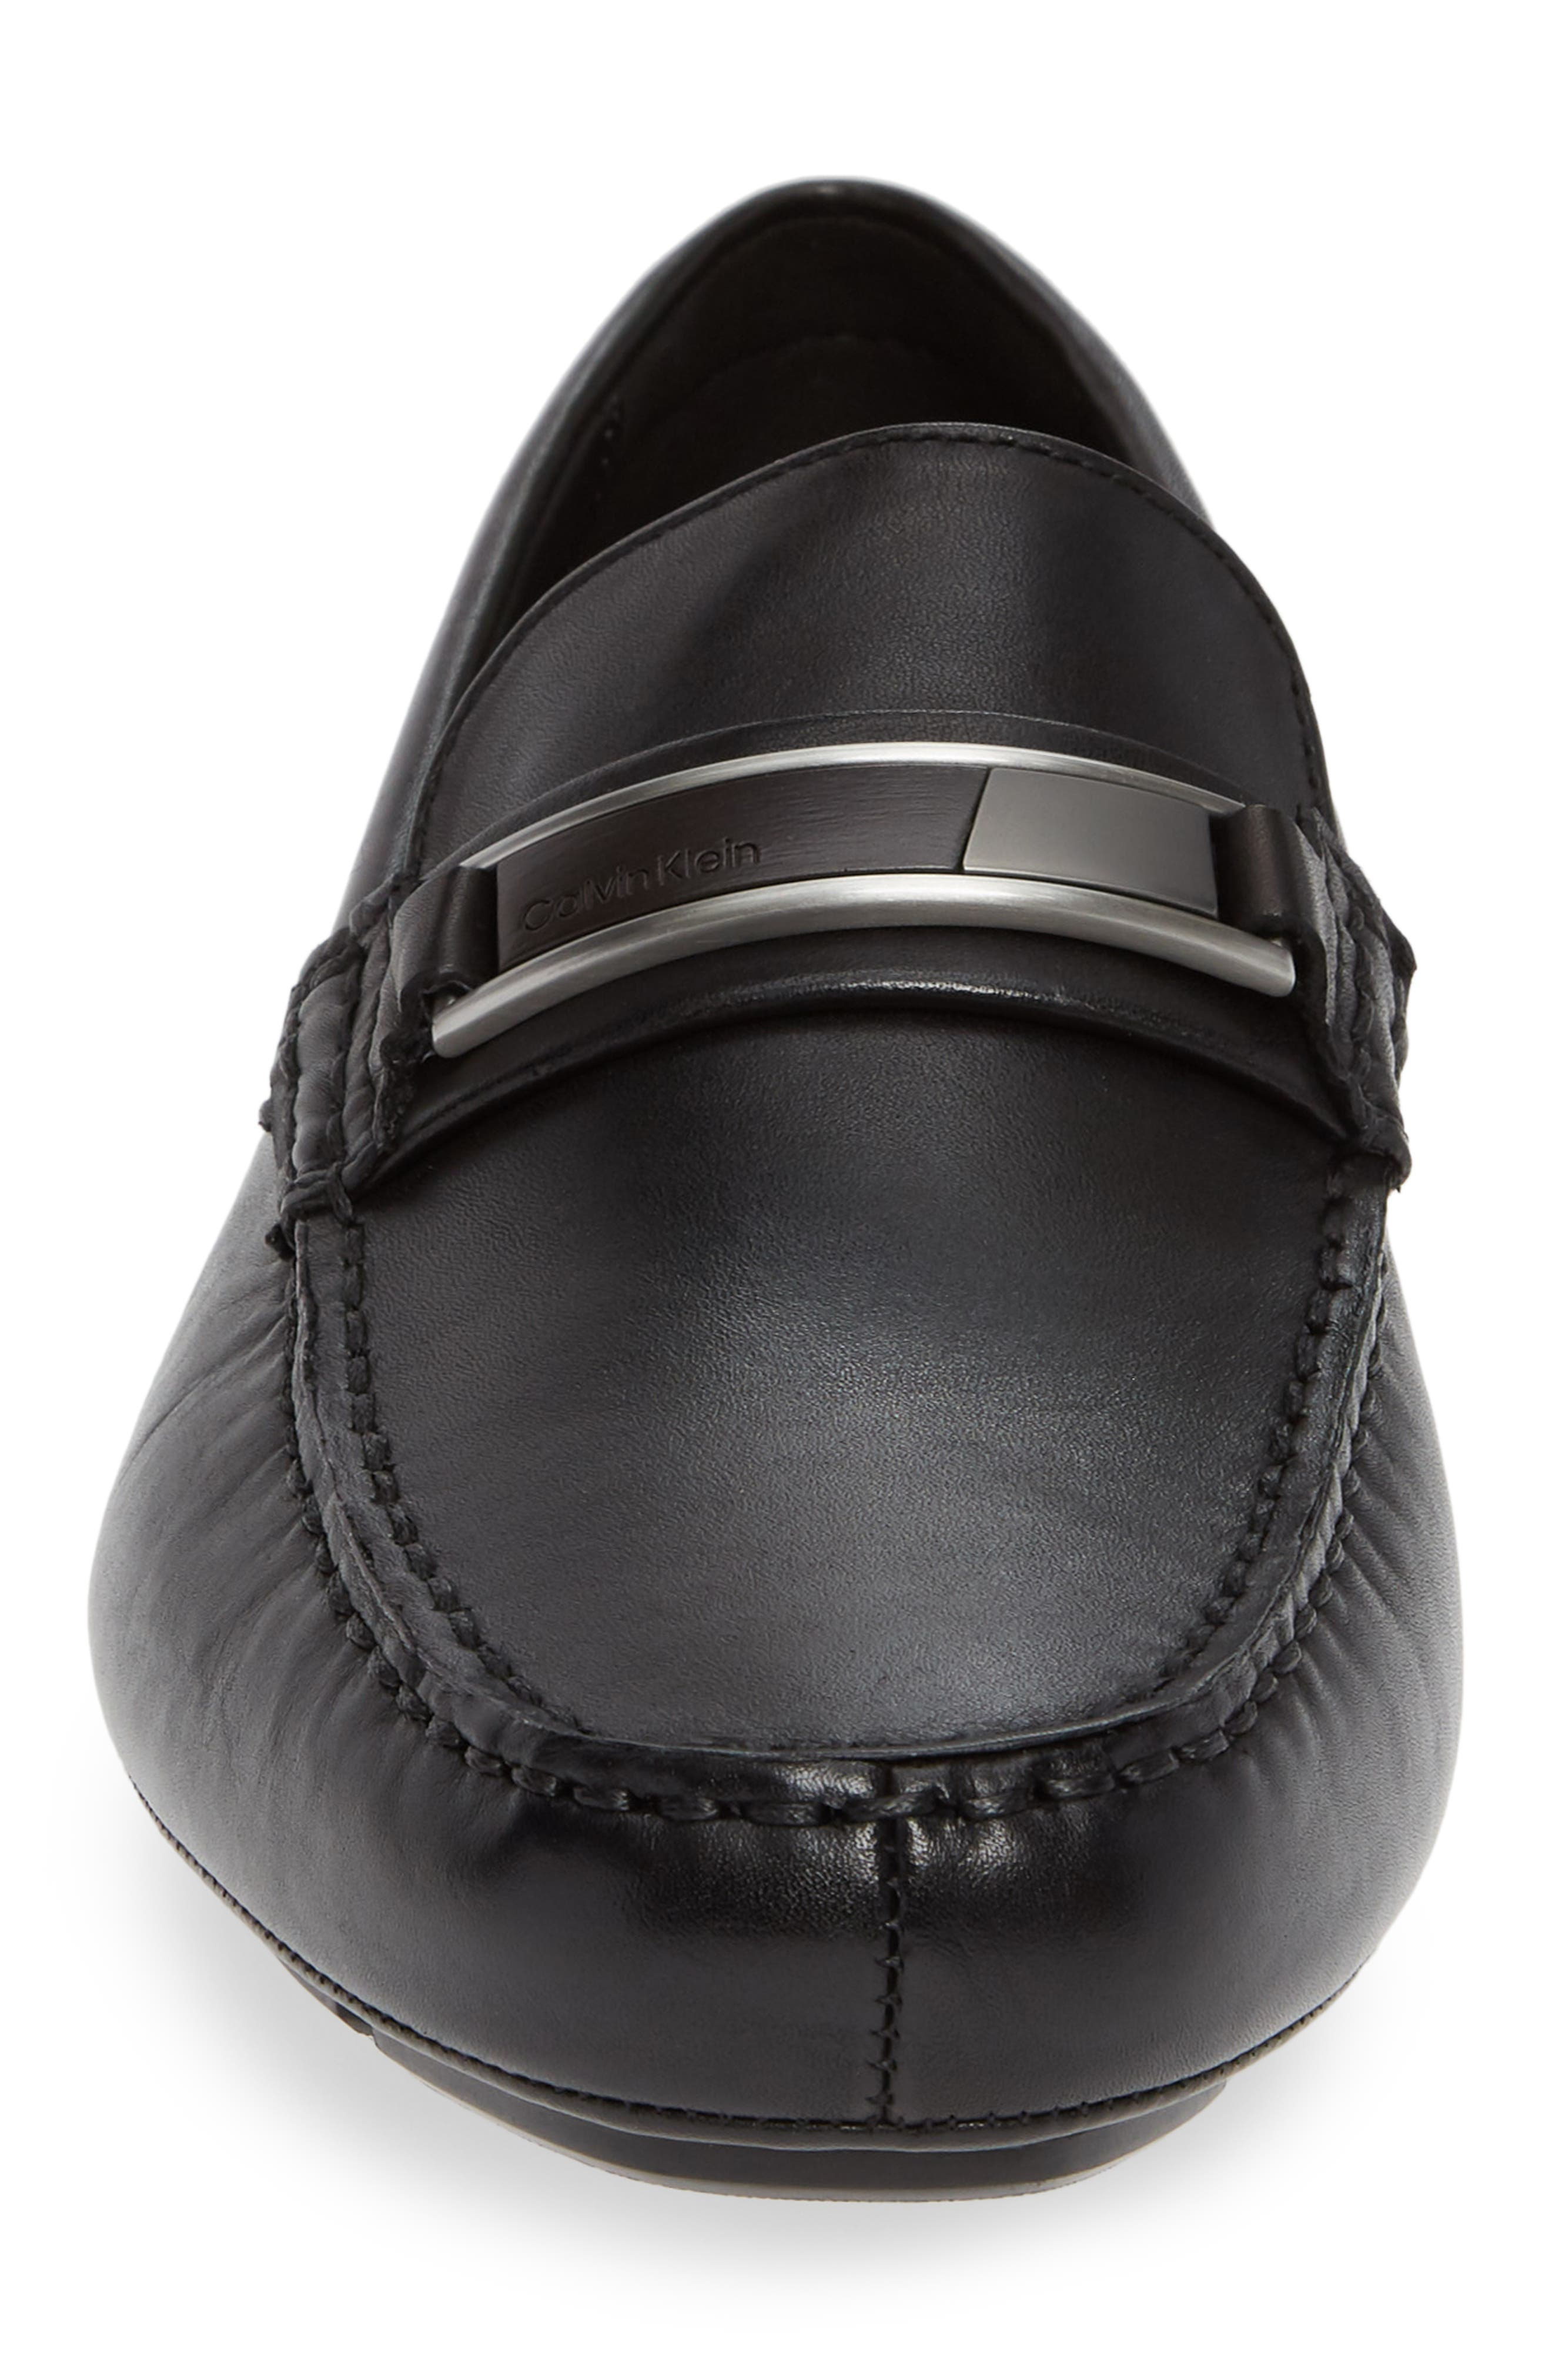 Kadison Buckle Driving Shoe,                             Alternate thumbnail 4, color,                             BLACK LEATHER